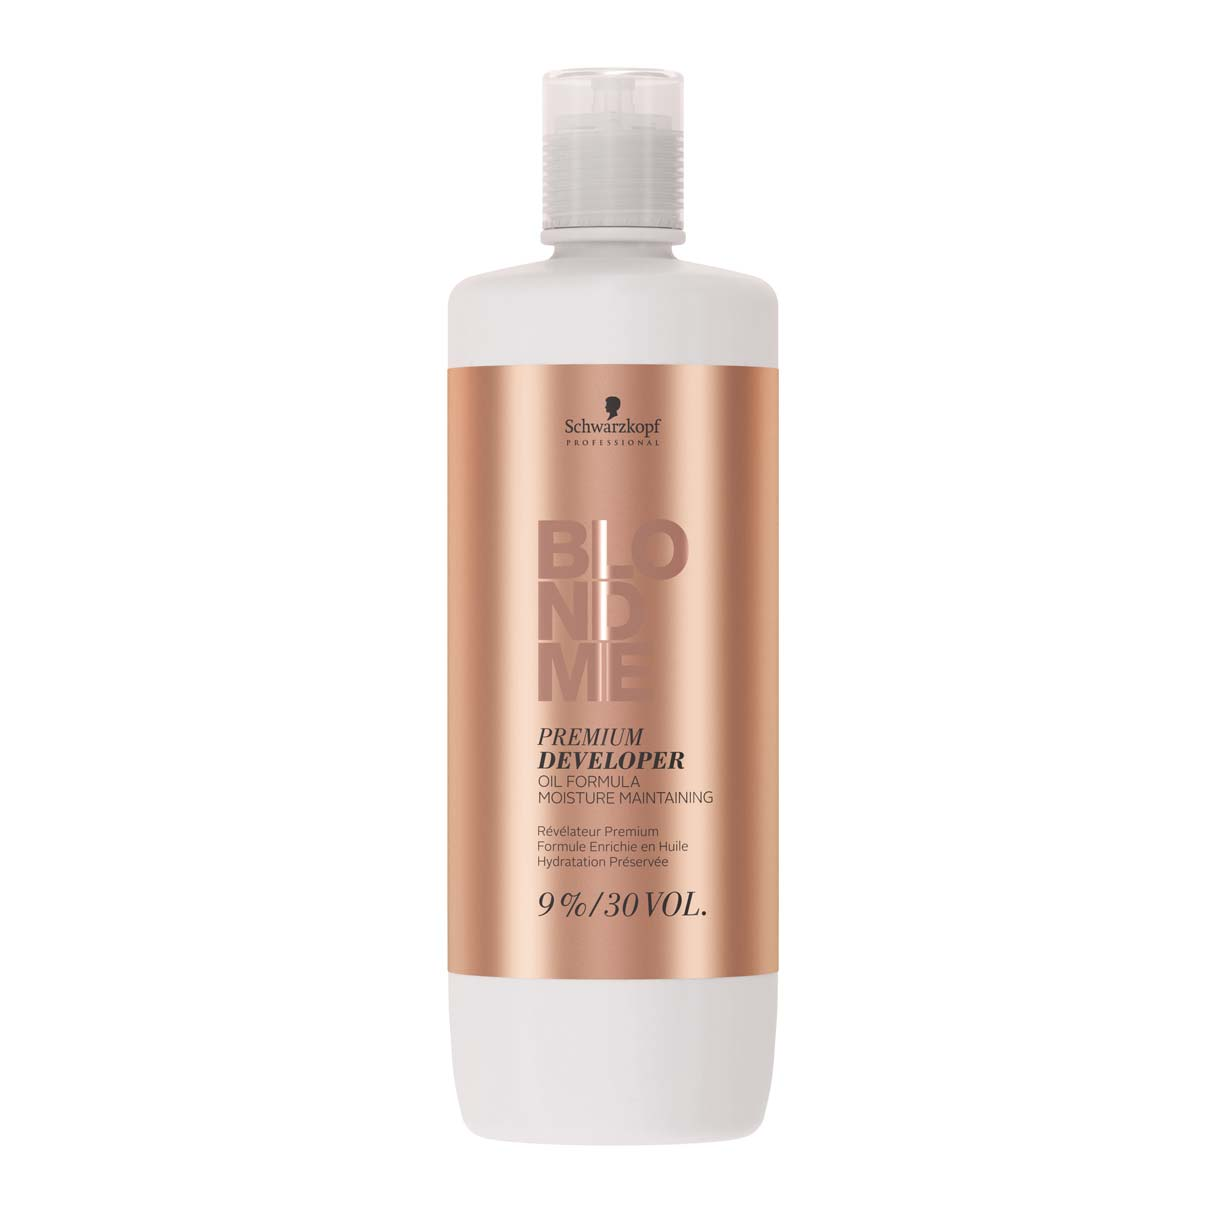 Schwarzkopf Professional BlondMe Loção Ativadora Premium 9% 30 Vol 1000ml